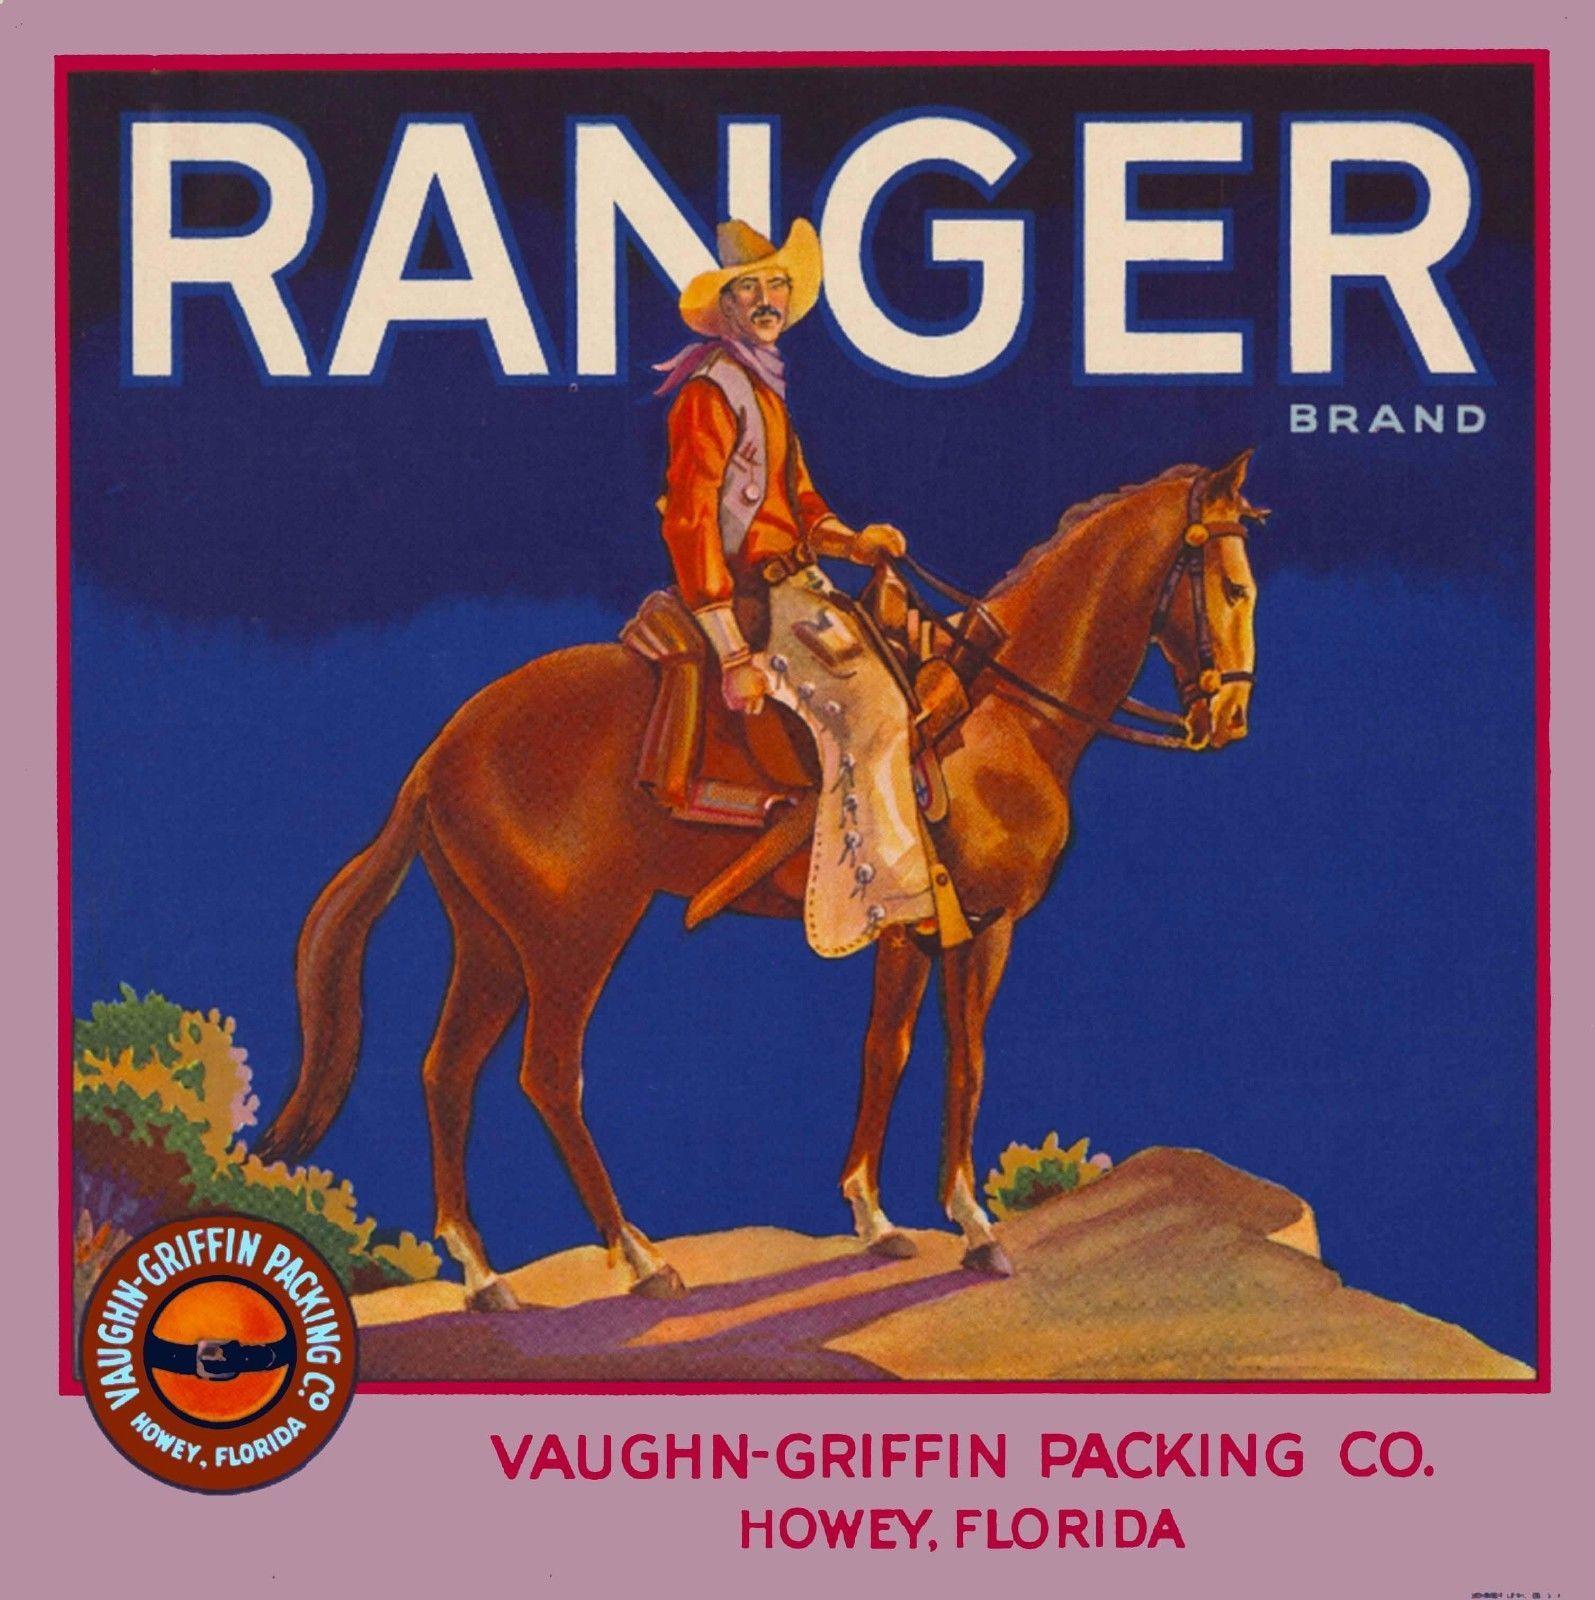 Howey Florida Ranger Brand Cowboy Orange Citrus Fruit Crate Label Art Print